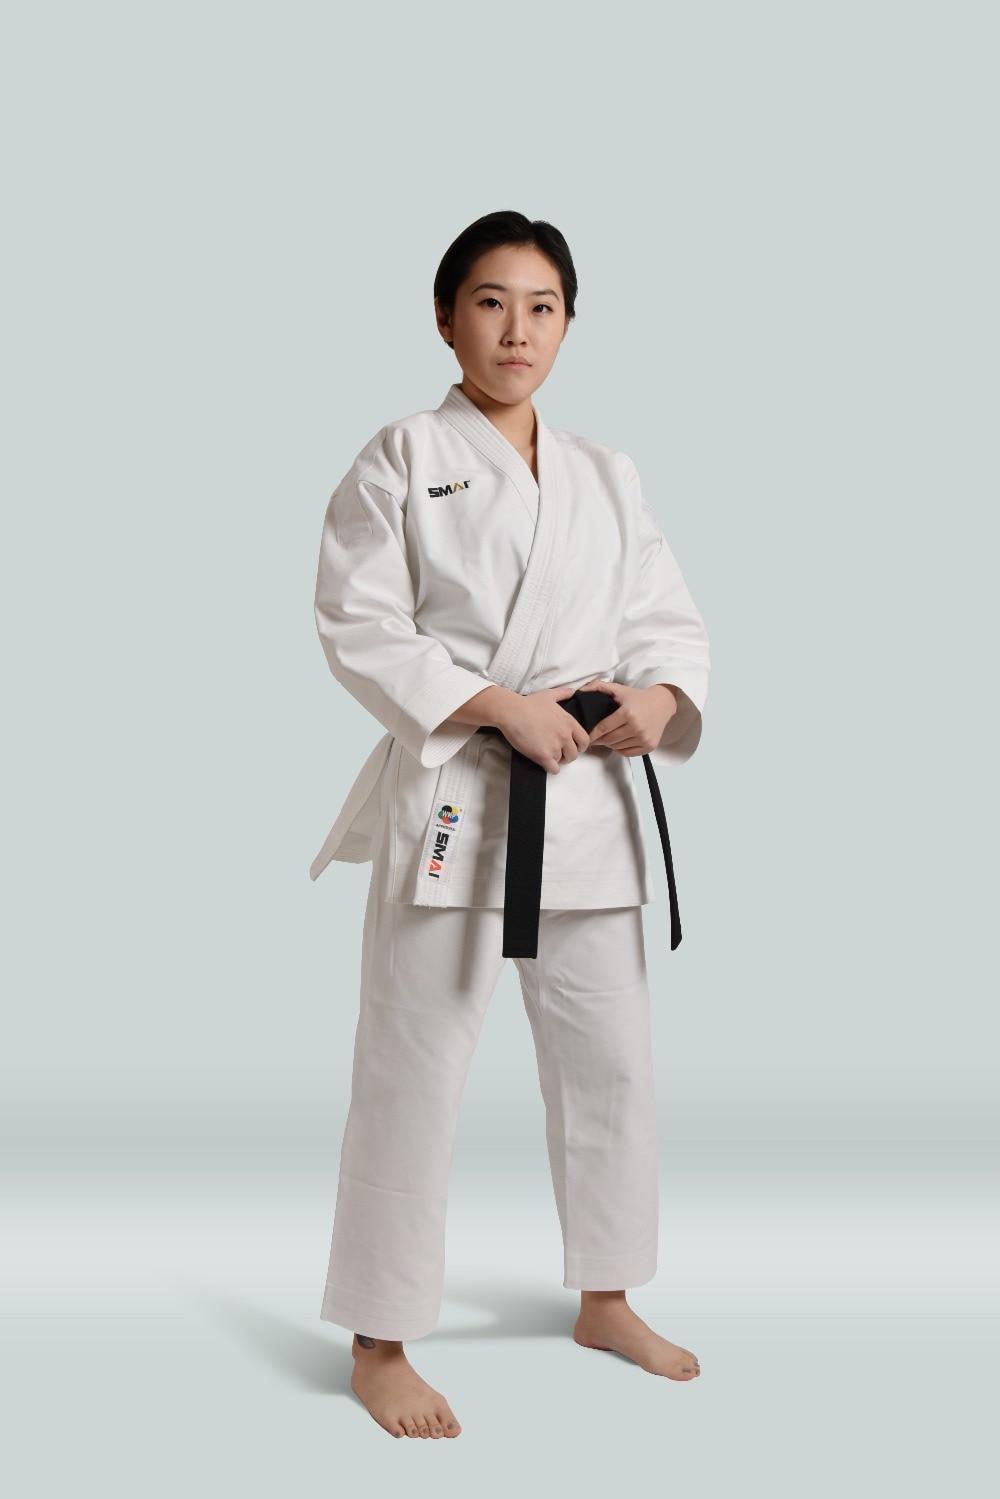 Original Kata Karategi GI SMAI Official Karate Kata Uniforms, New Design Smai Karategi Kata Wkf Approved